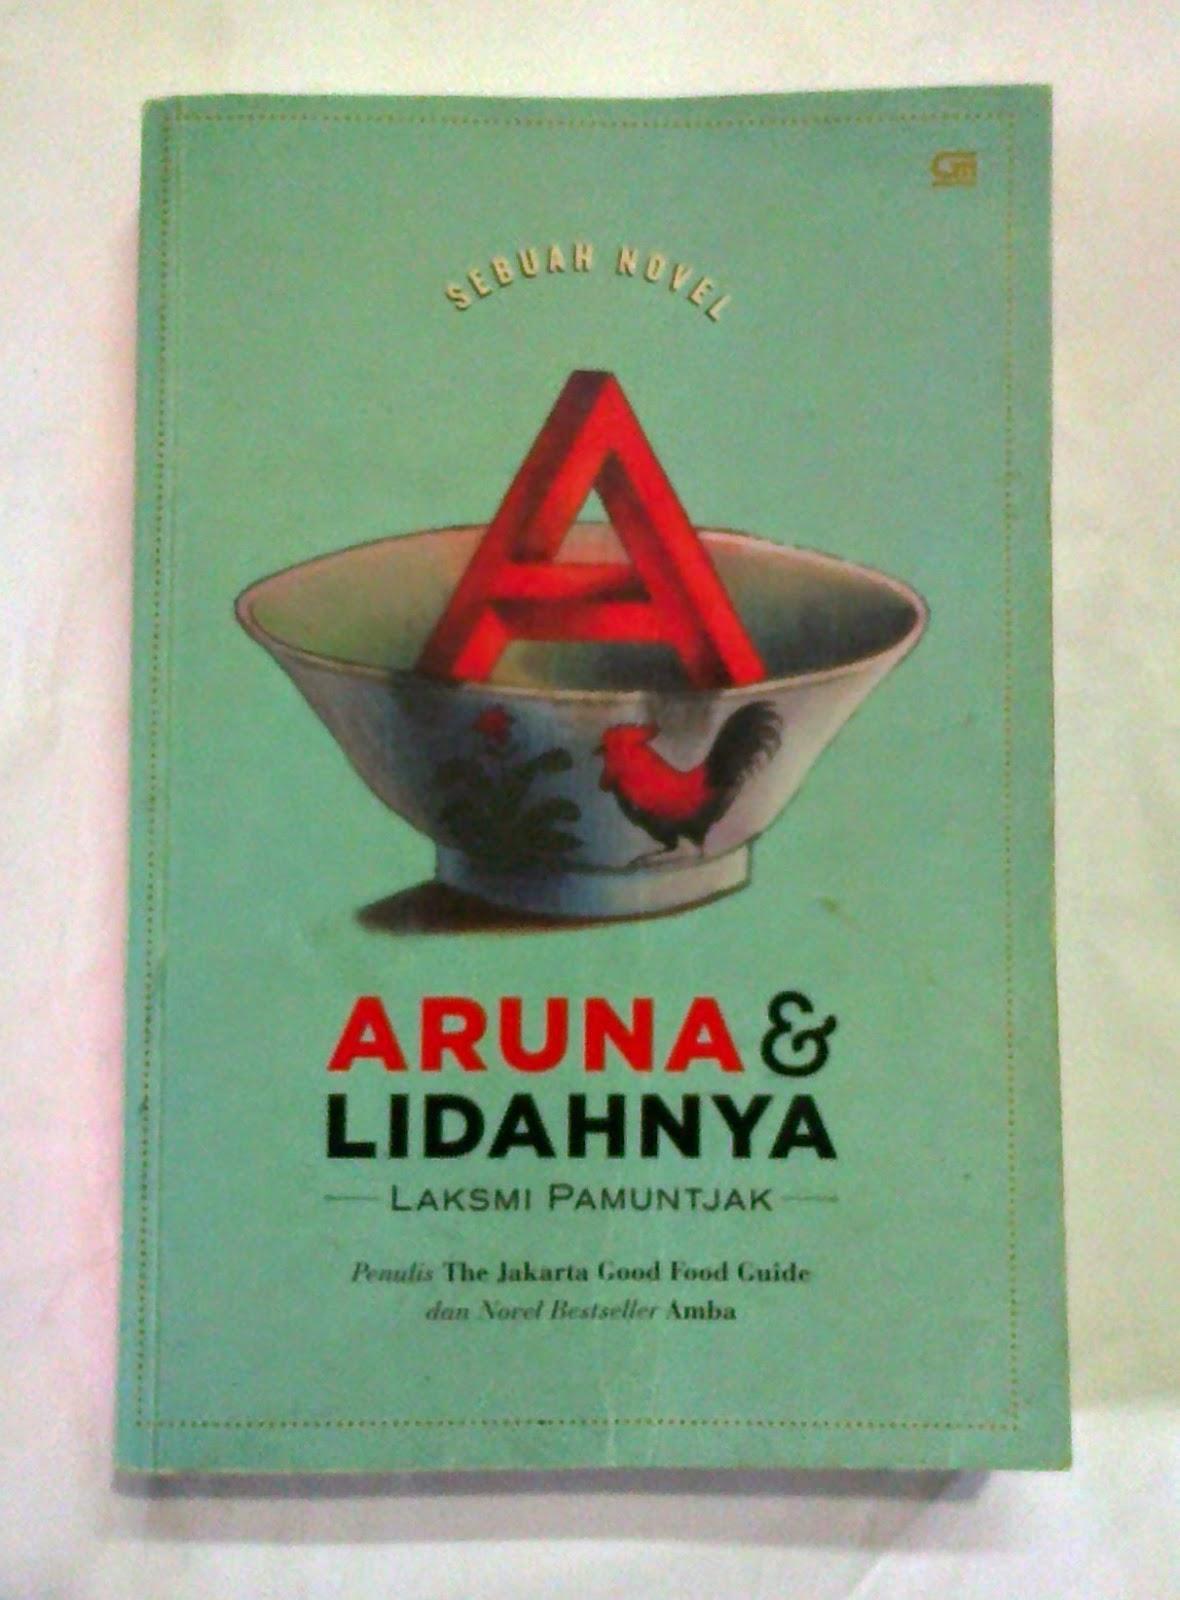 Aruna & Lidahnya - Laksmi Pamuntjak